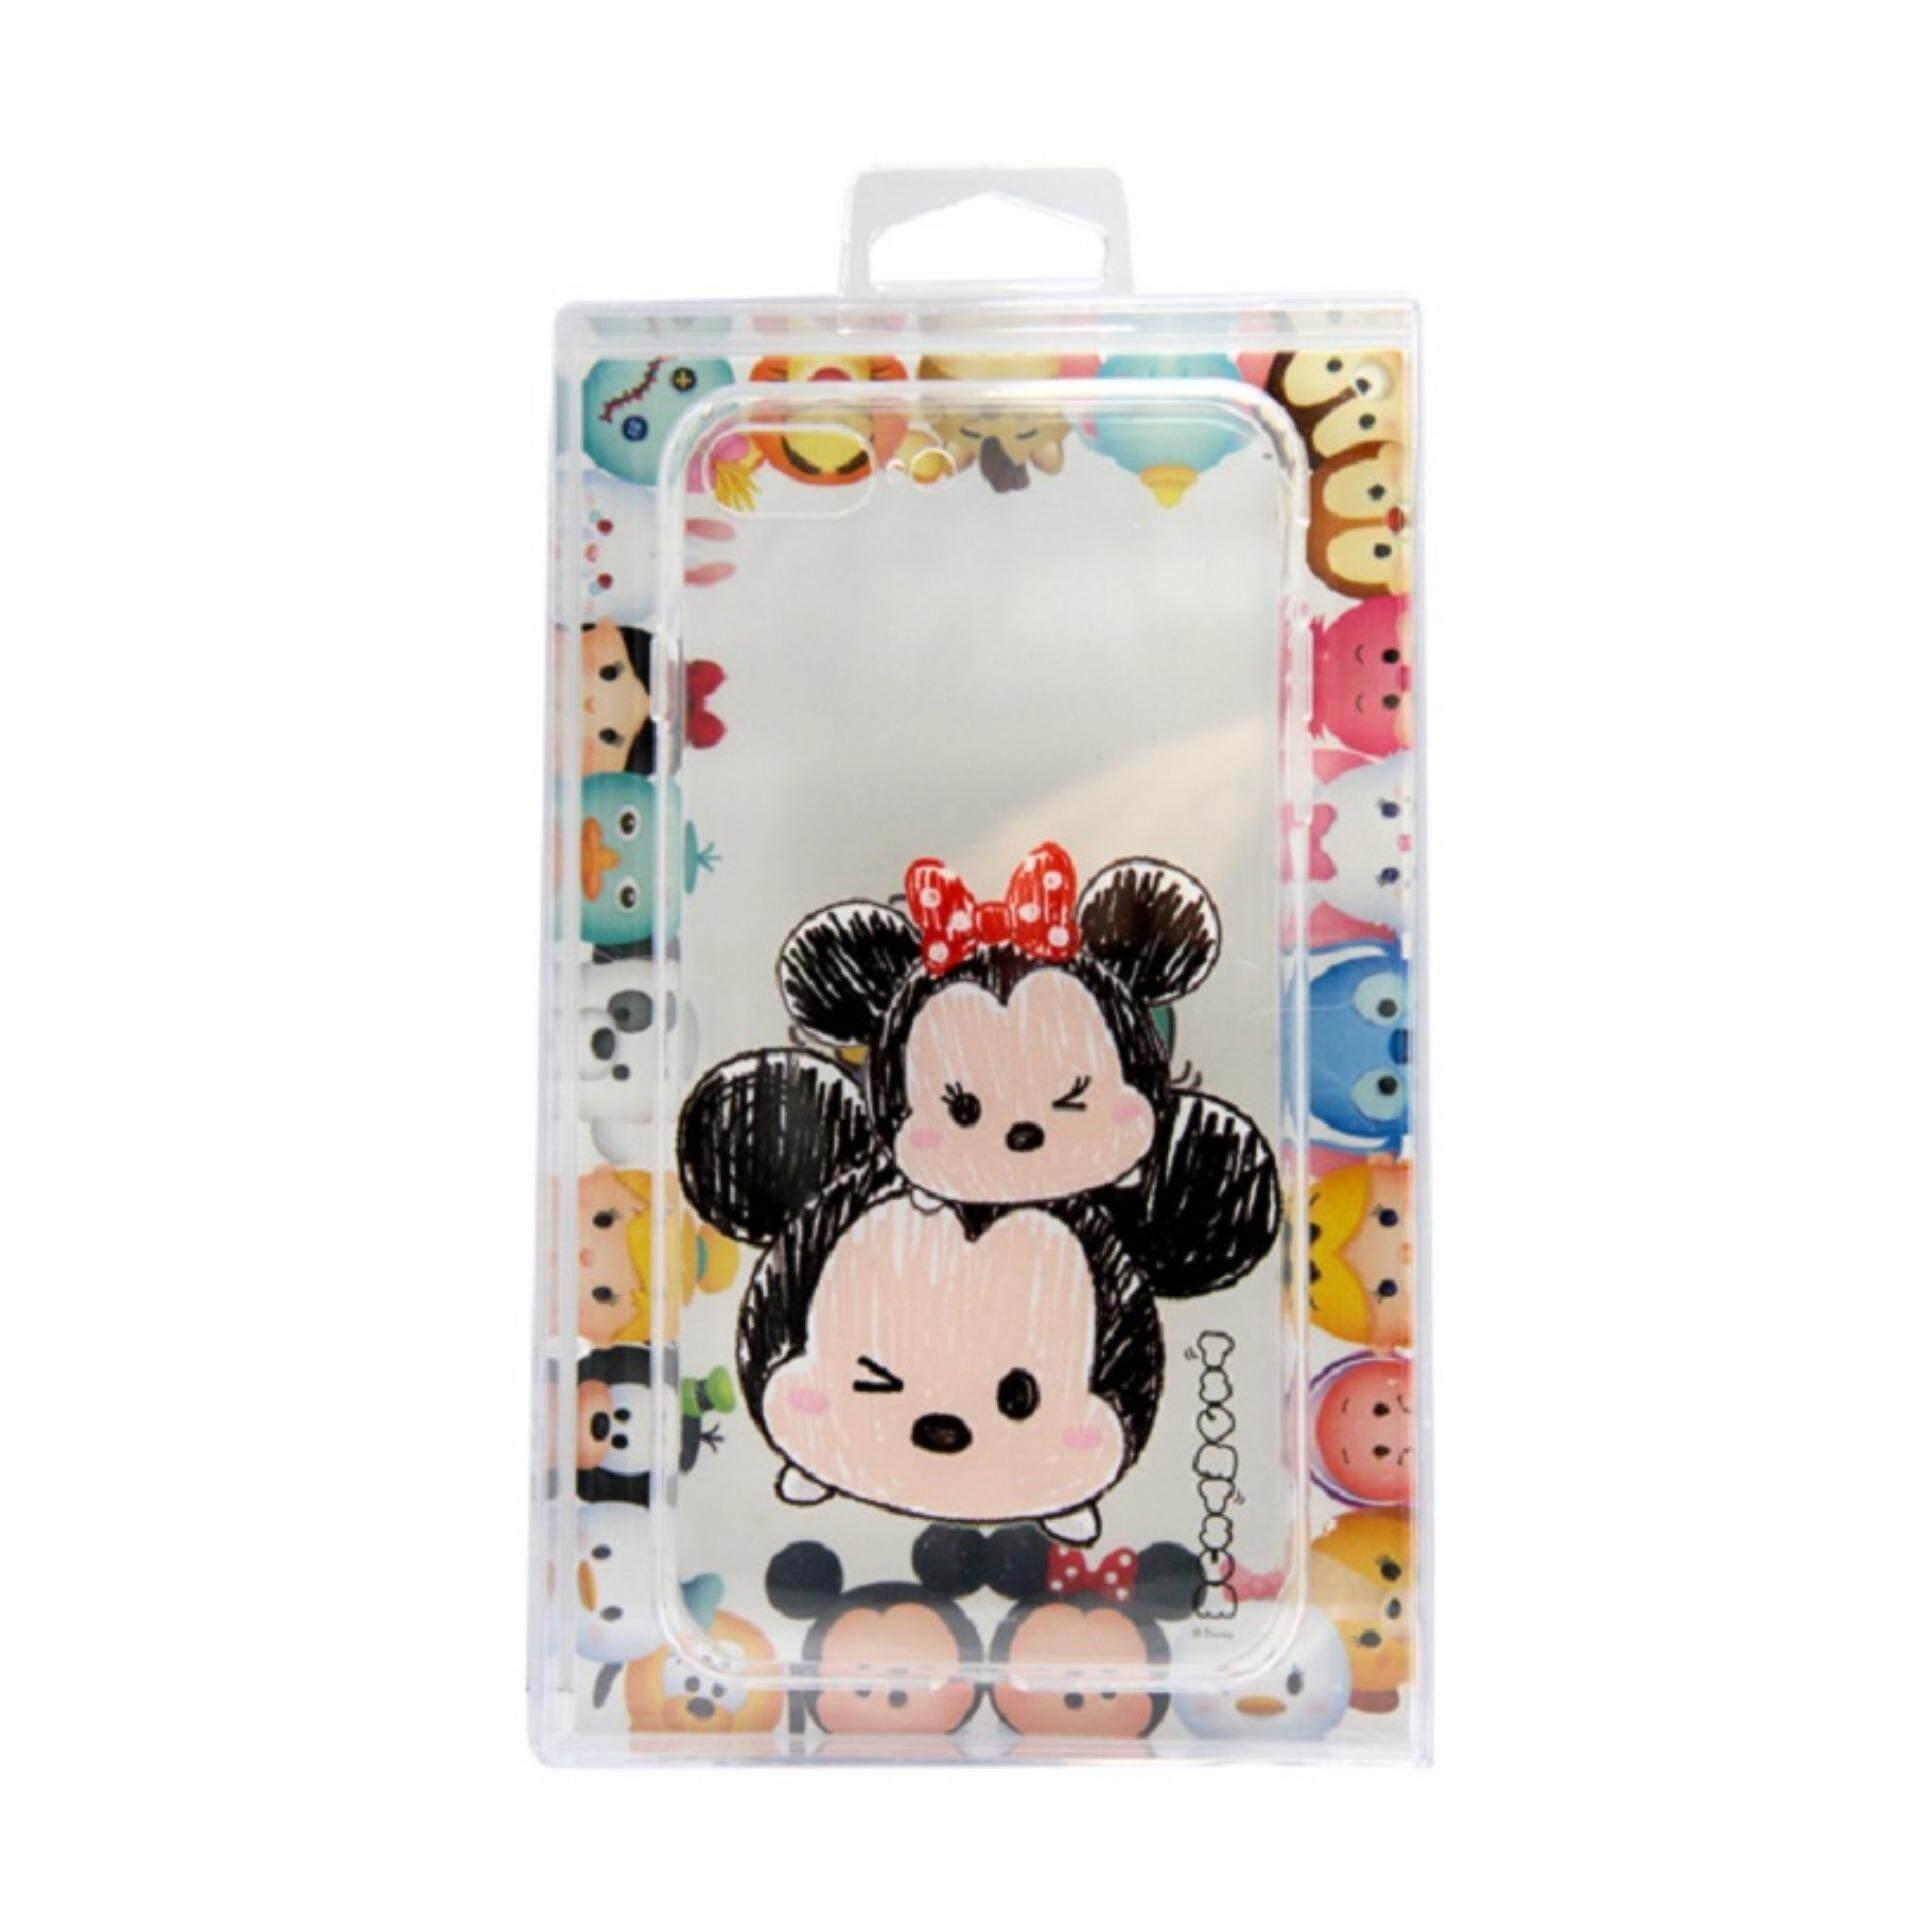 Disney Tsum Tsum Transparent iPhone 7 Plus Case - Mickey & Minnie